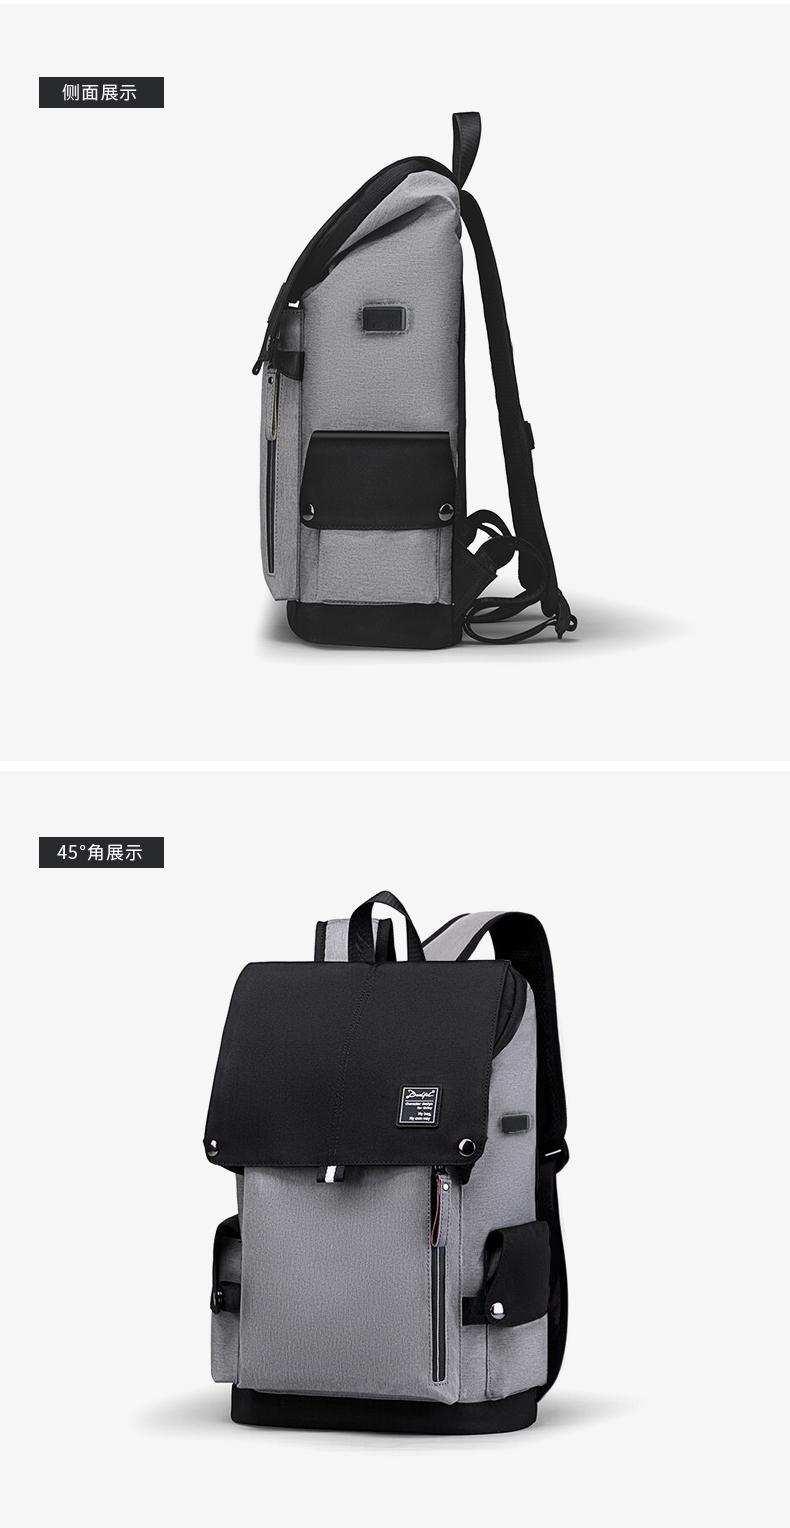 Casual backpack men's backpack fashion trend youth men's bag large capacity computer bag tide 21